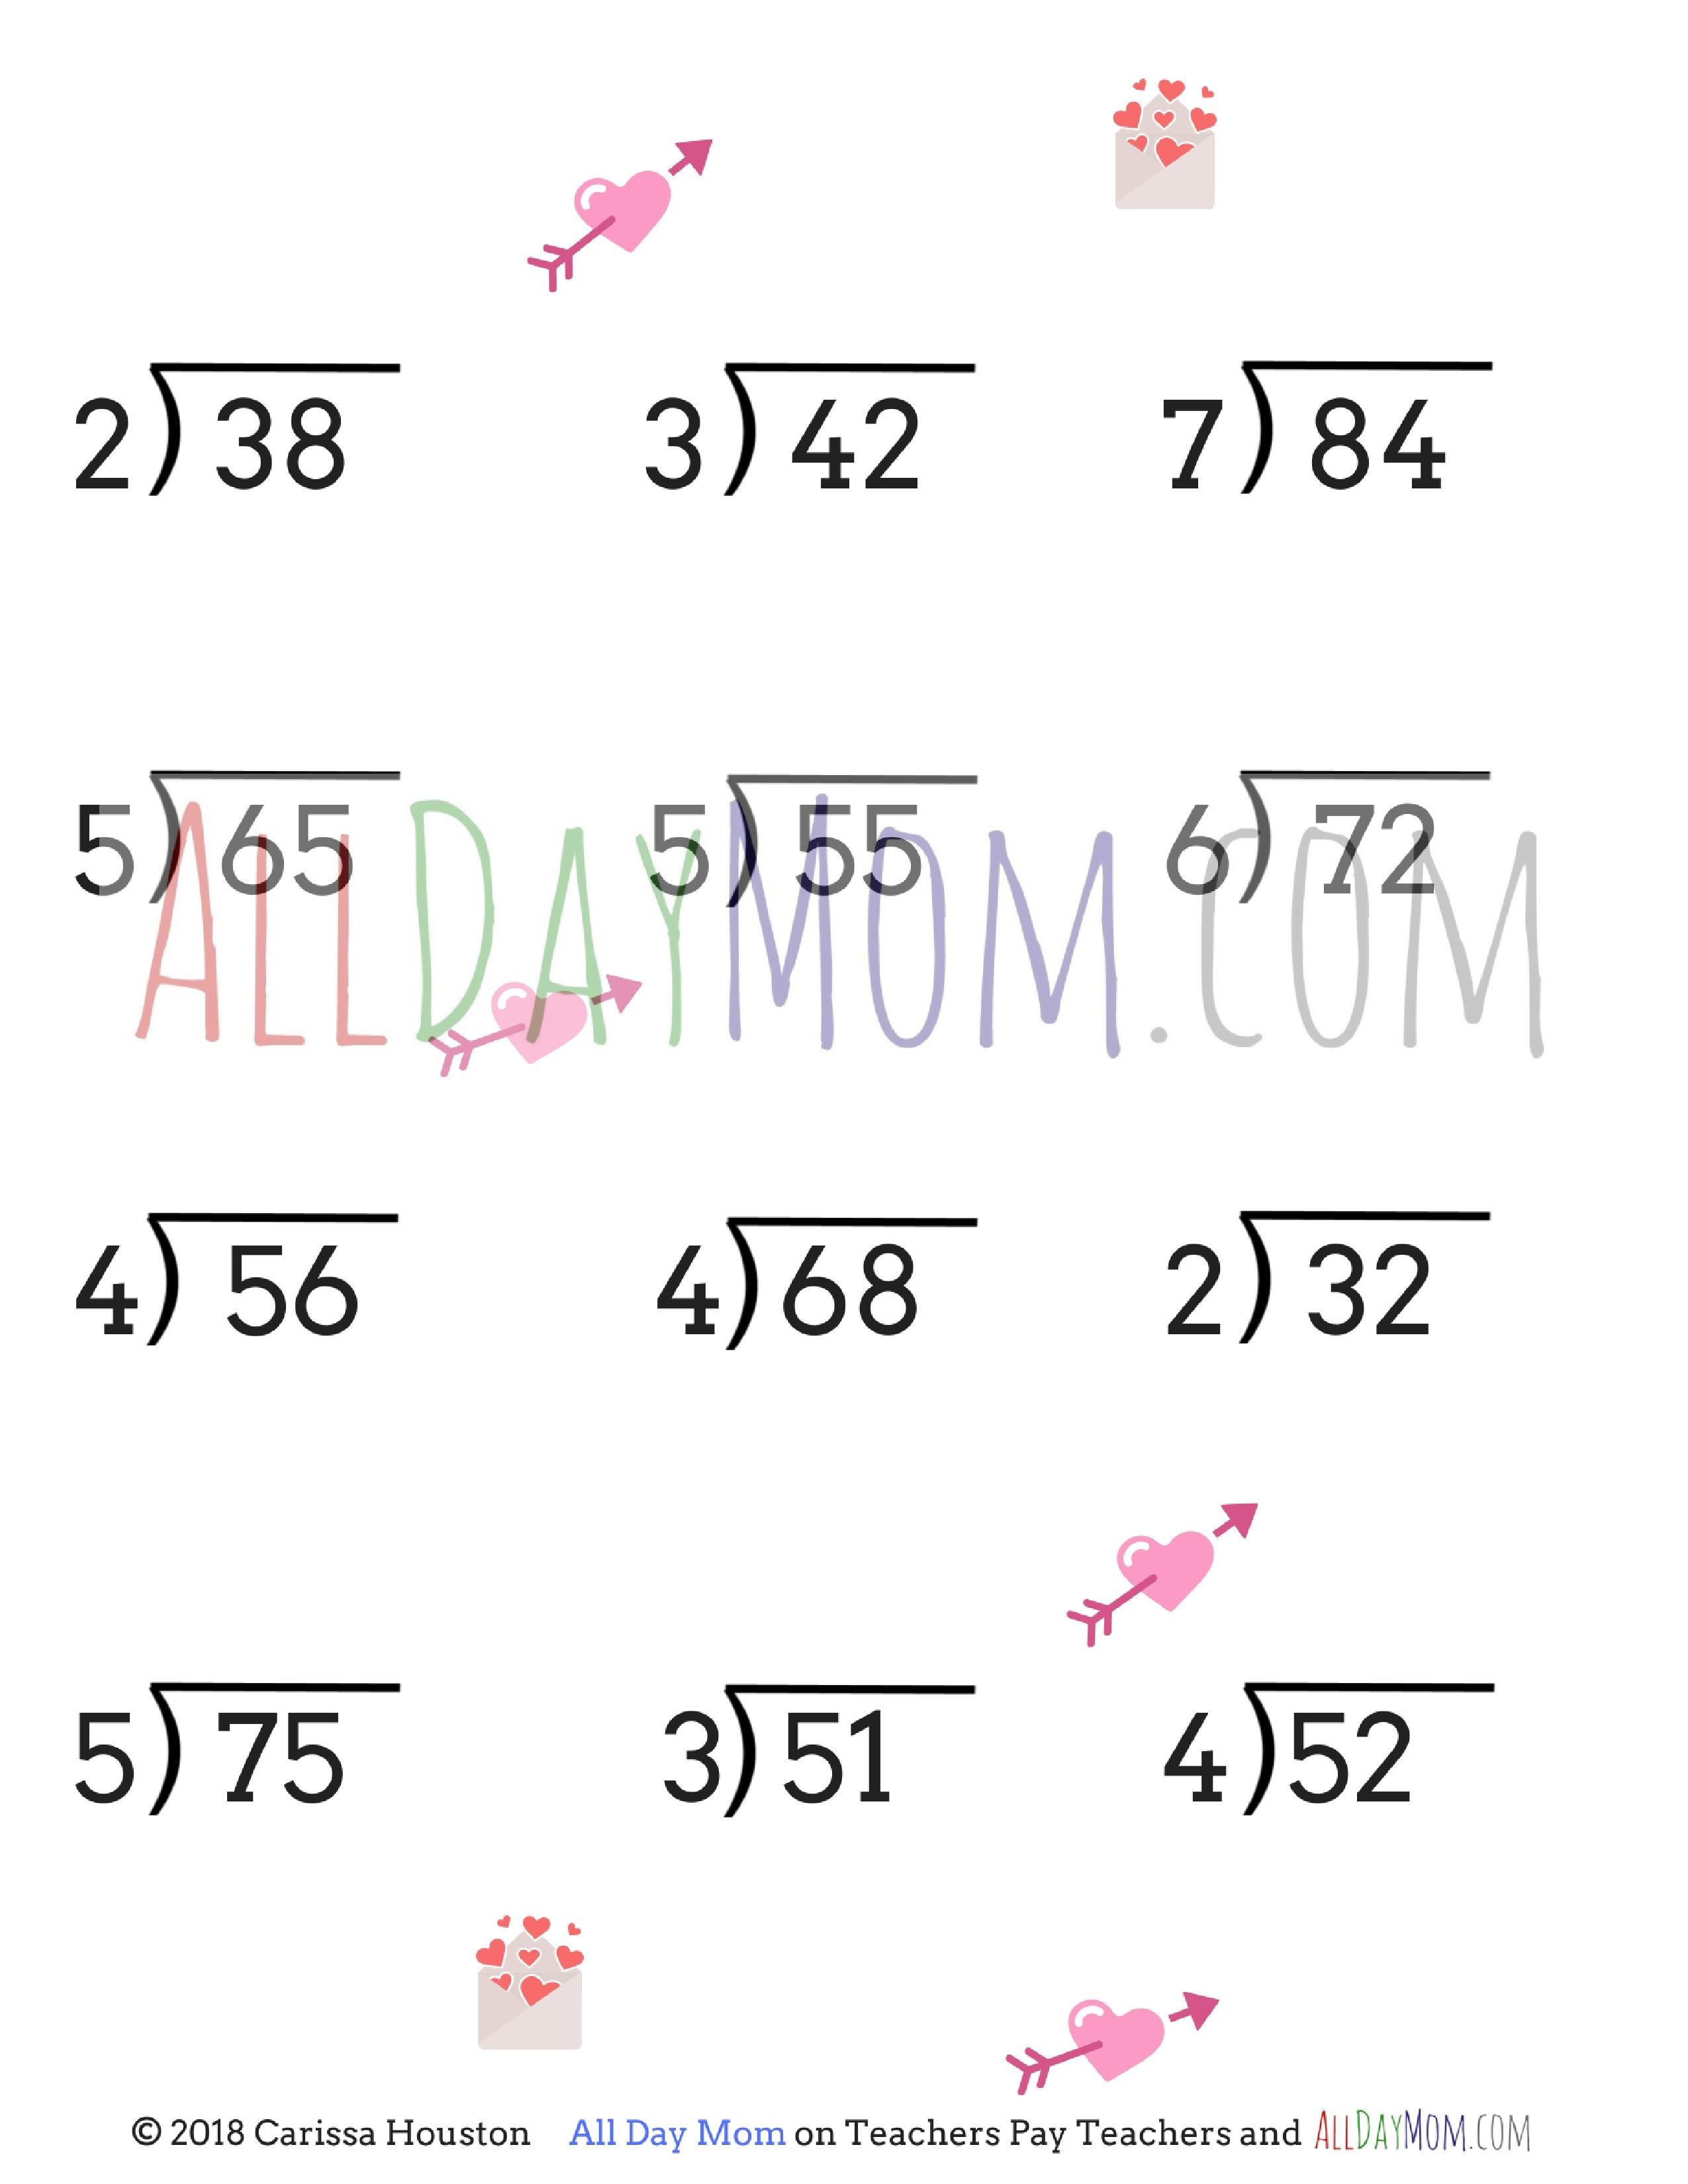 Free printable Valentine's Day math worksheets! [ 3300 x 2550 Pixel ]